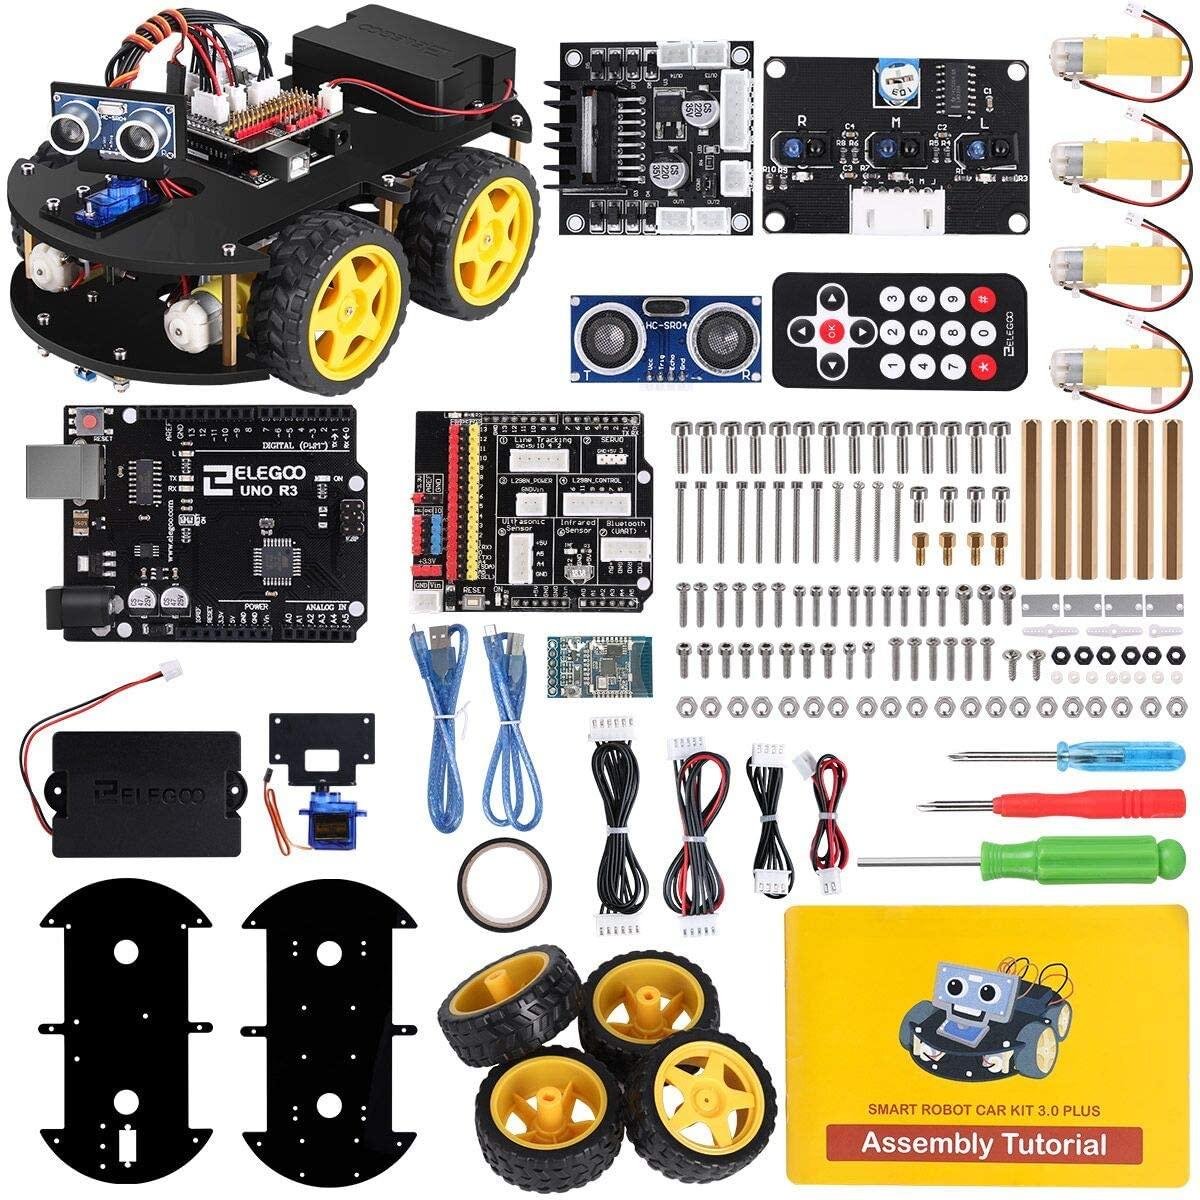 Kit Robot ELEGOO per Arduino